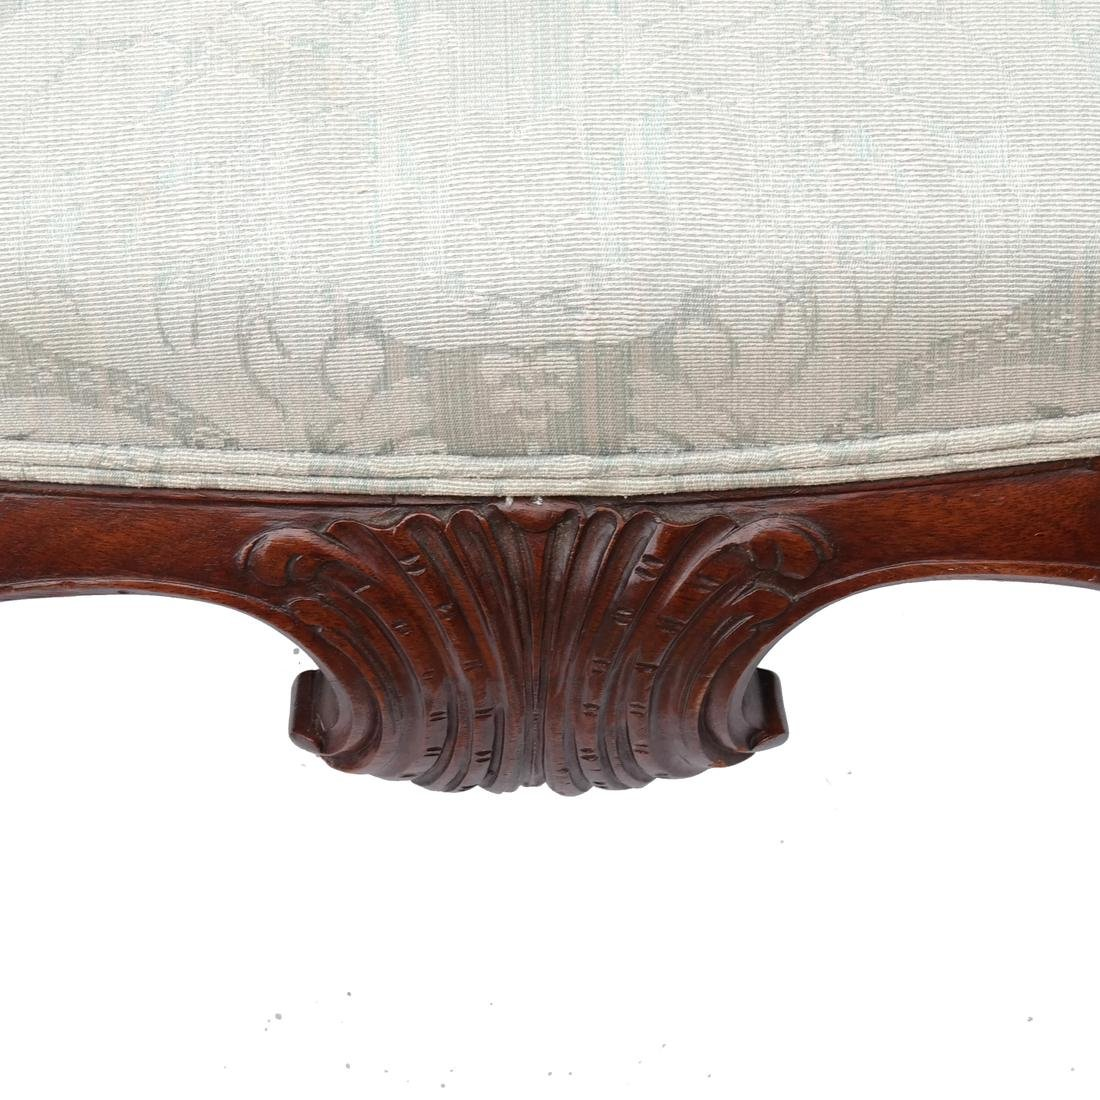 Irish Ball & Claw Wing Chair 19th Century - 4